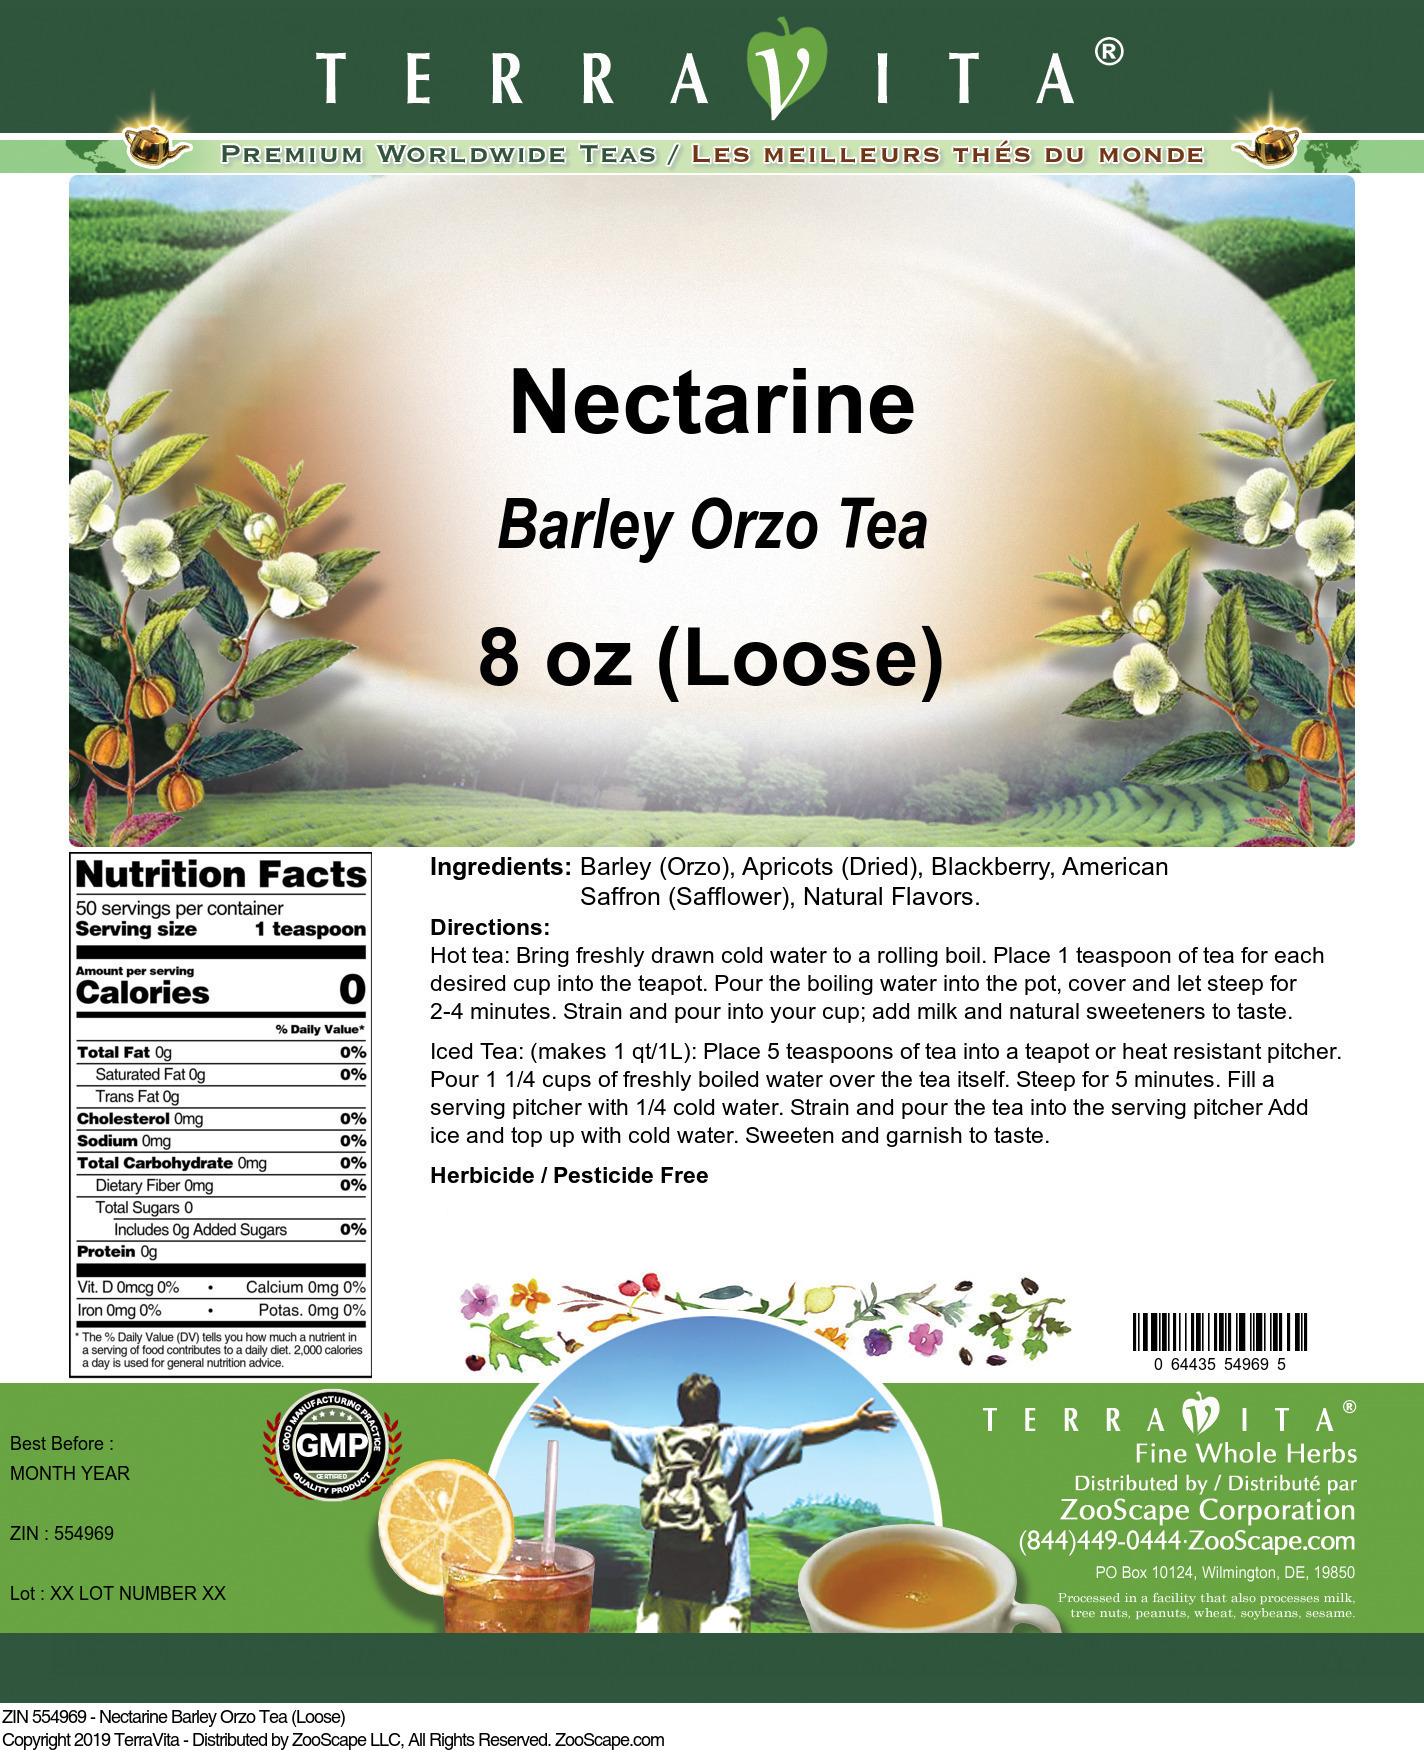 Nectarine Barley Orzo Tea (Loose)